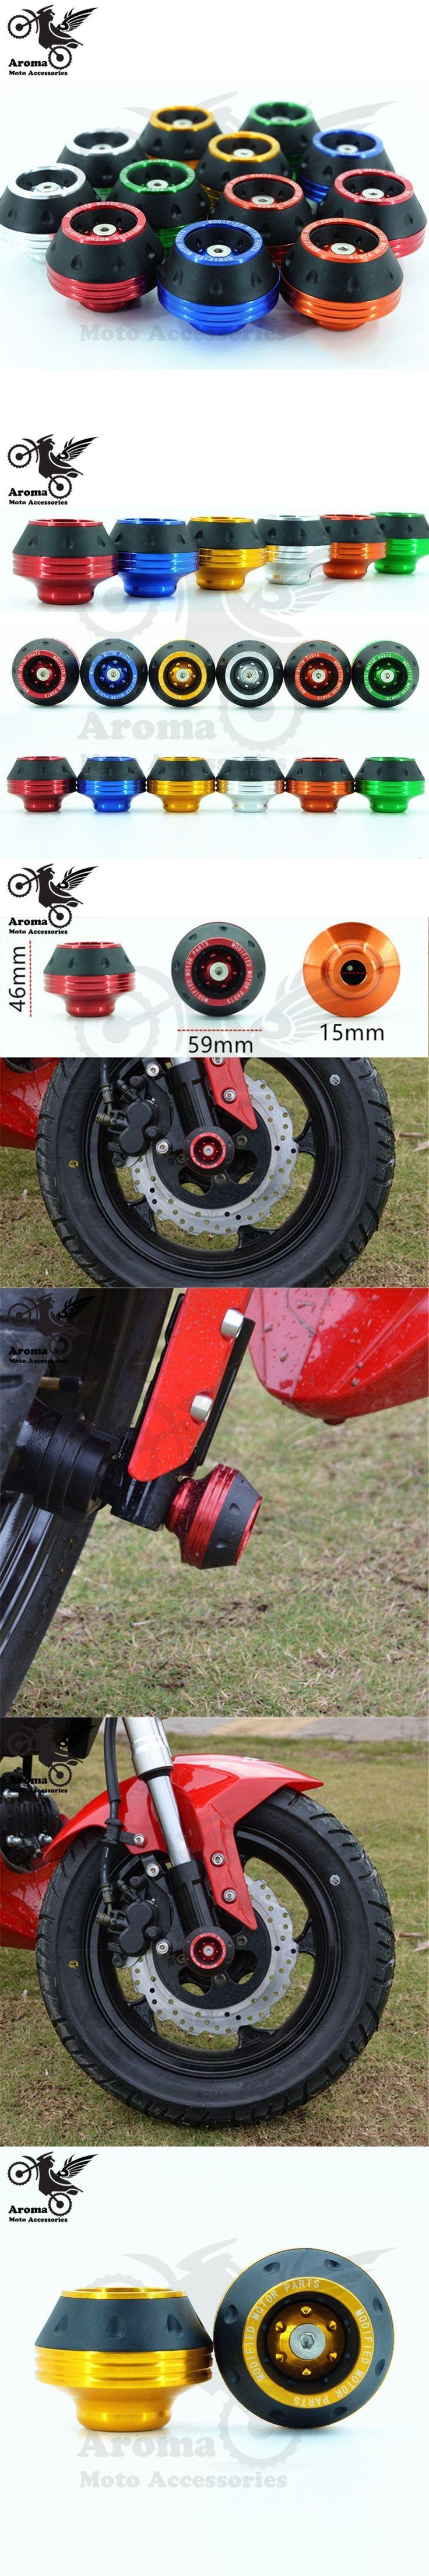 colorful CNC motorcycle Frame Slider crash pads protectors for KTM motocross crash protector motorbike Falling Protection parts